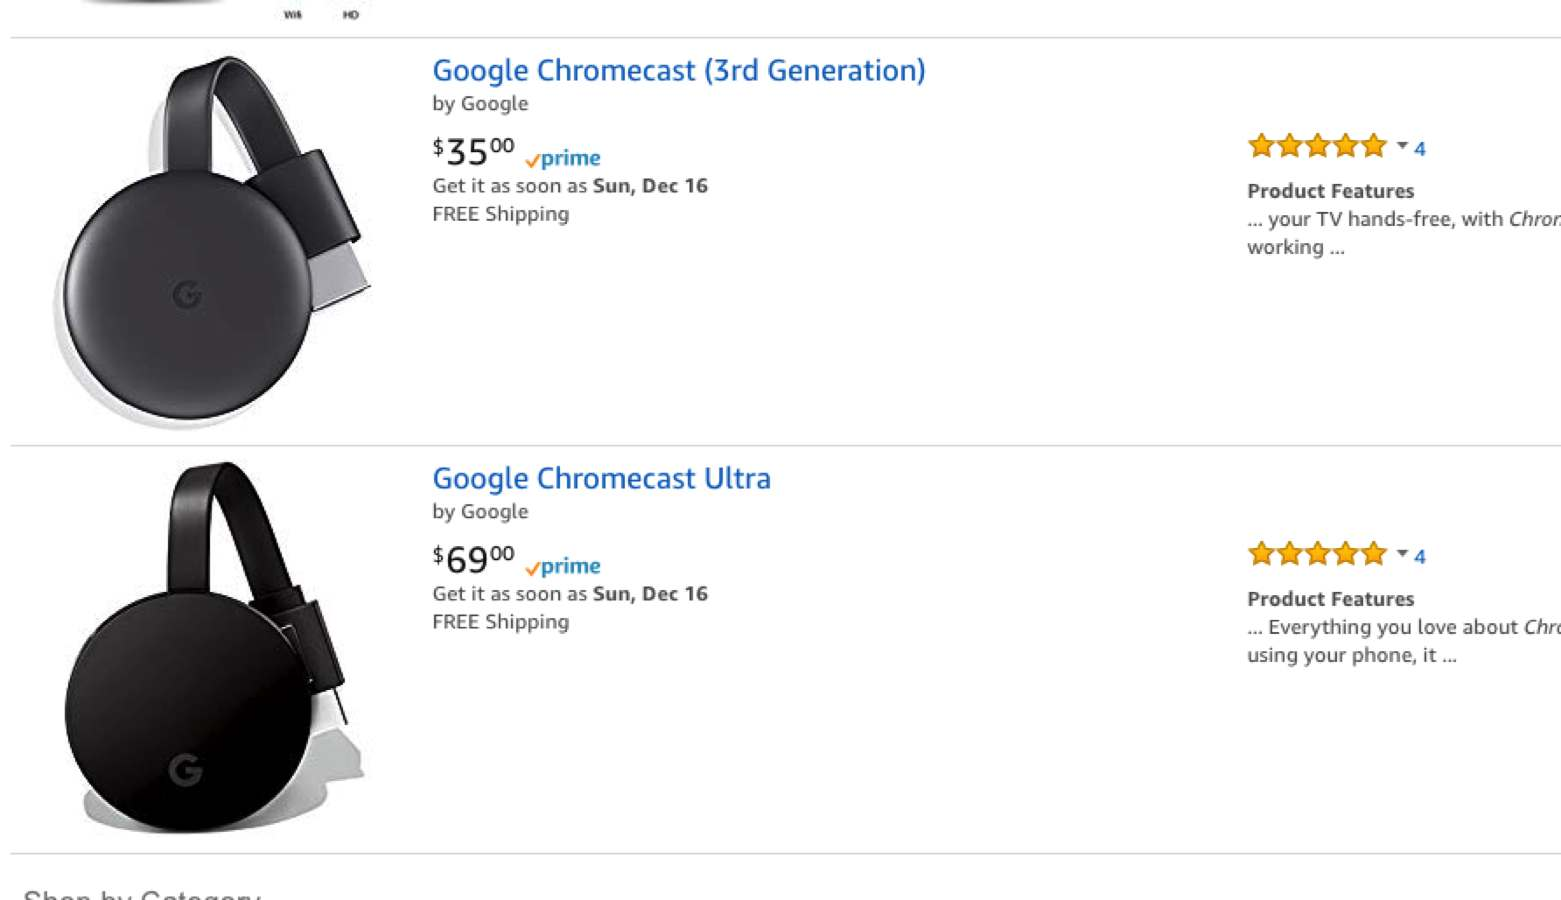 google chromecast on sale again at amazon prices